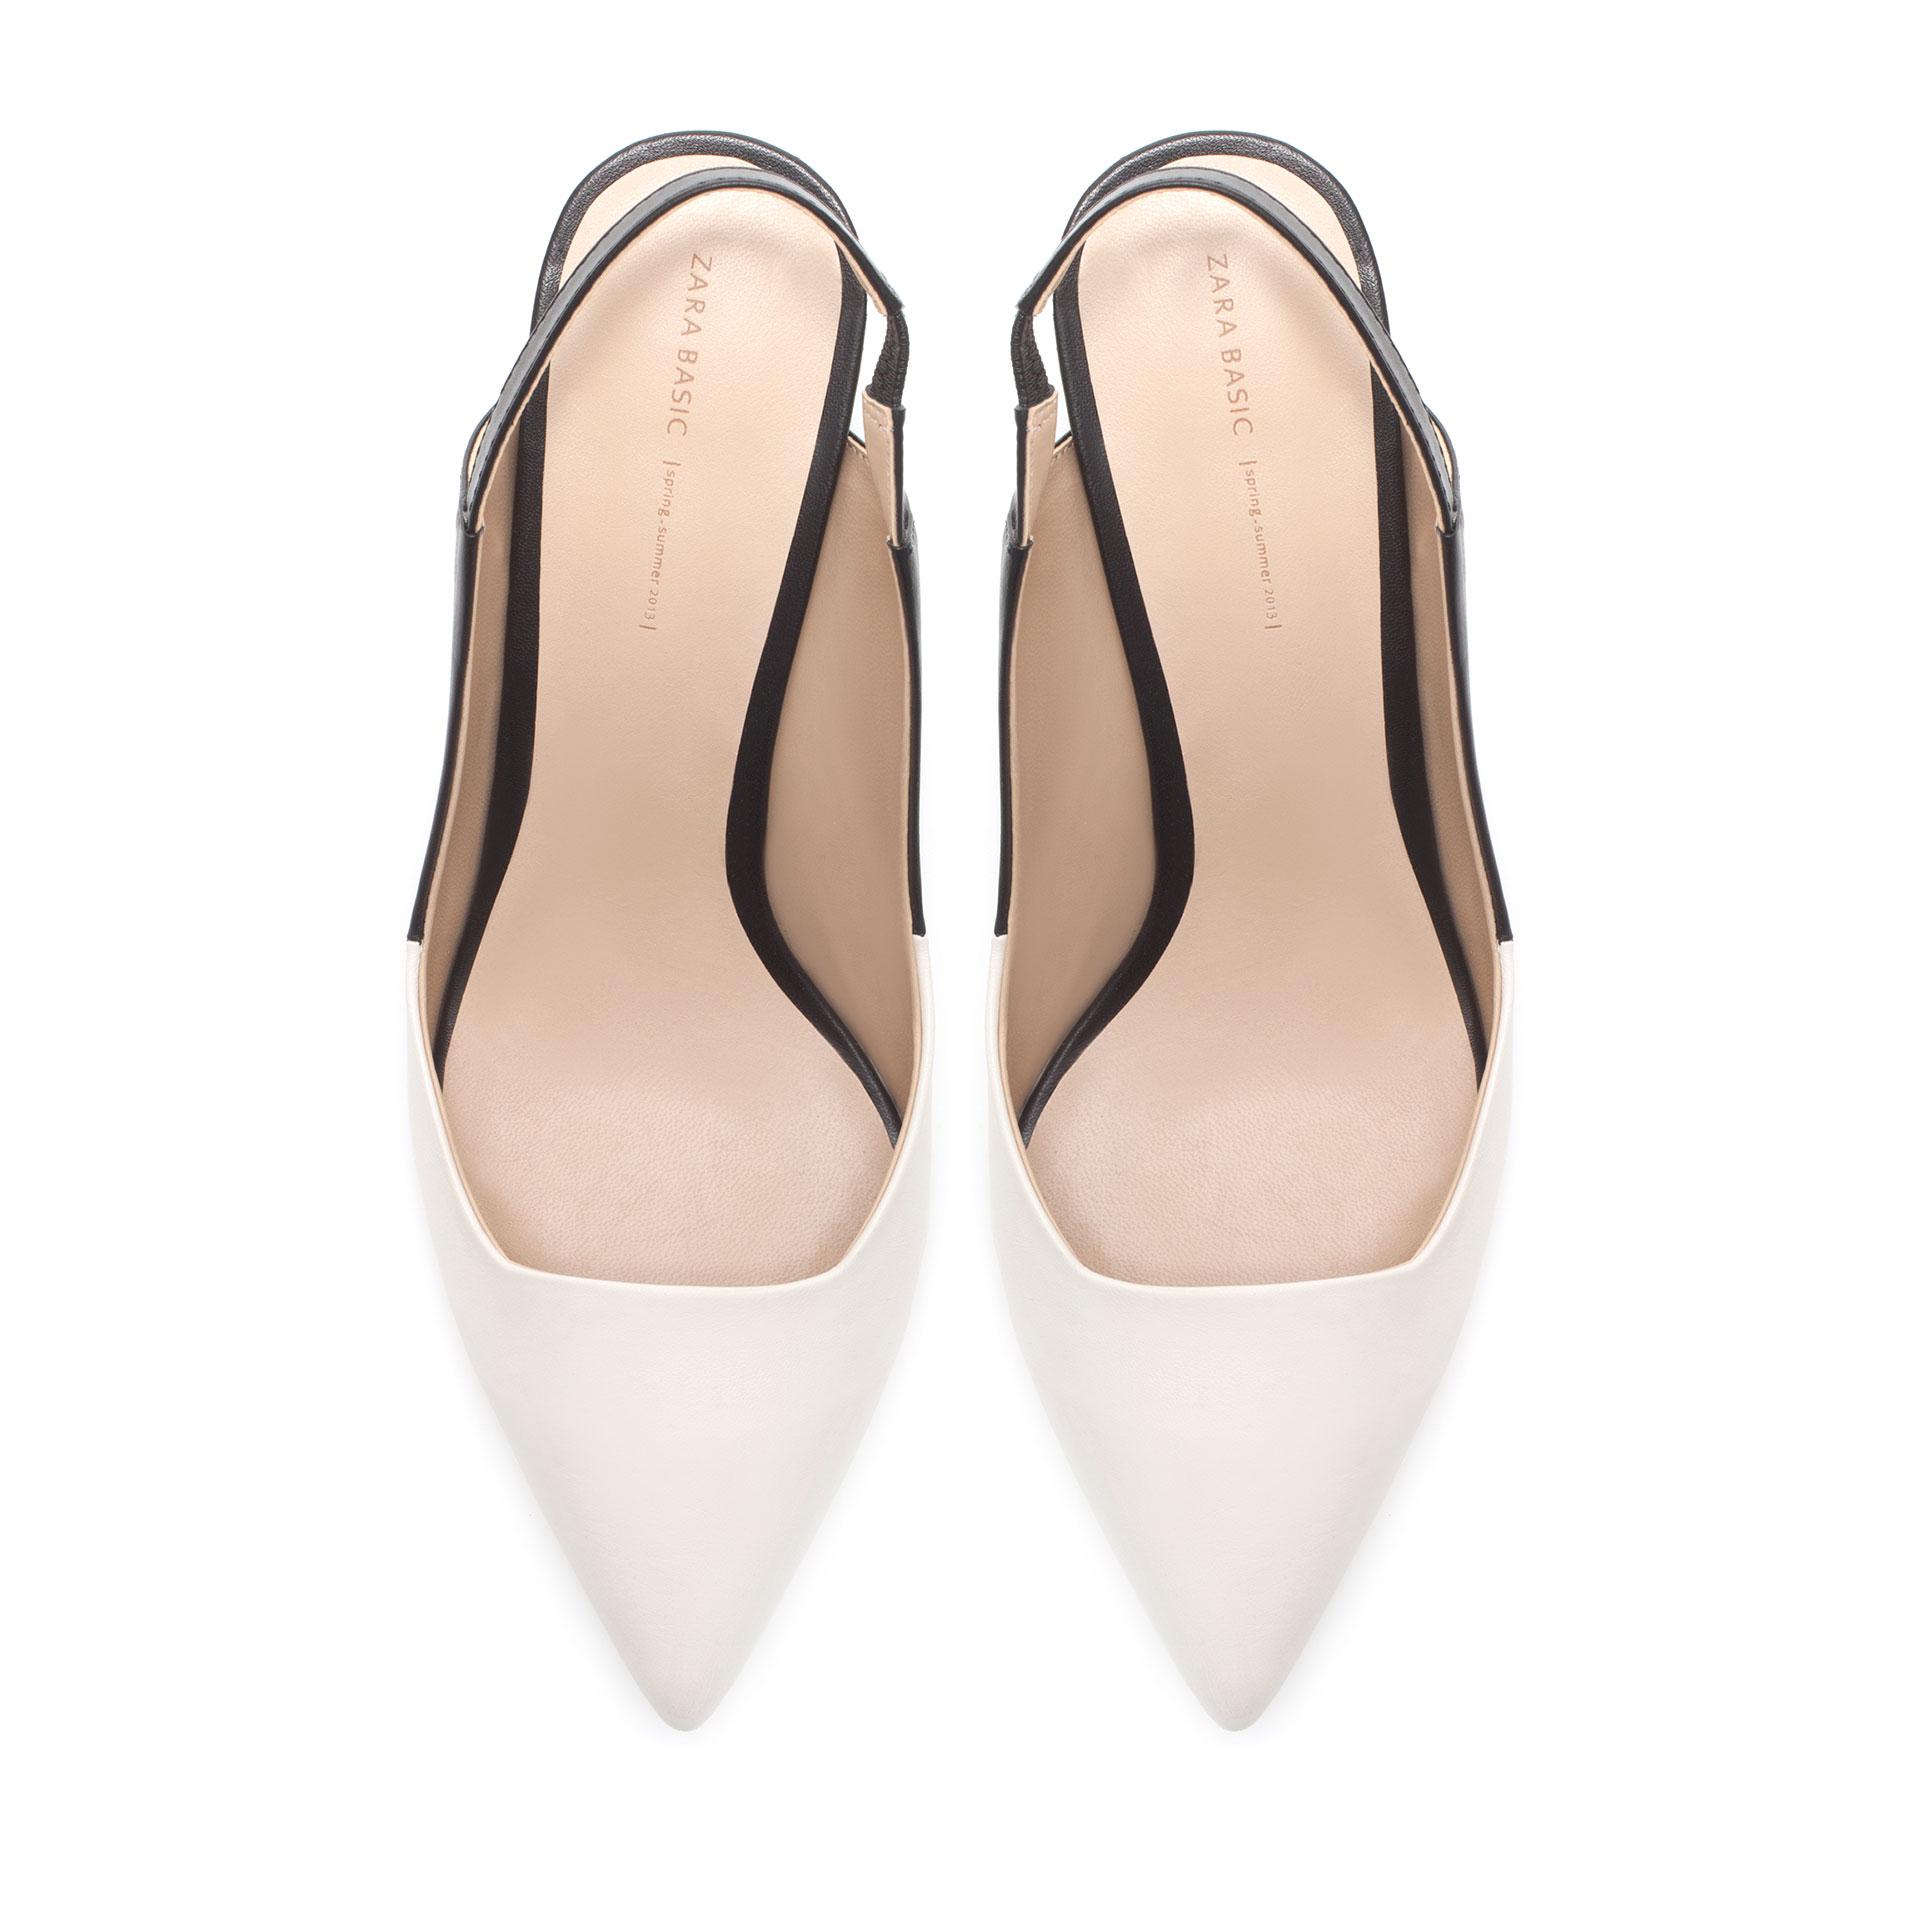 Zara Kitten Heel Shoes